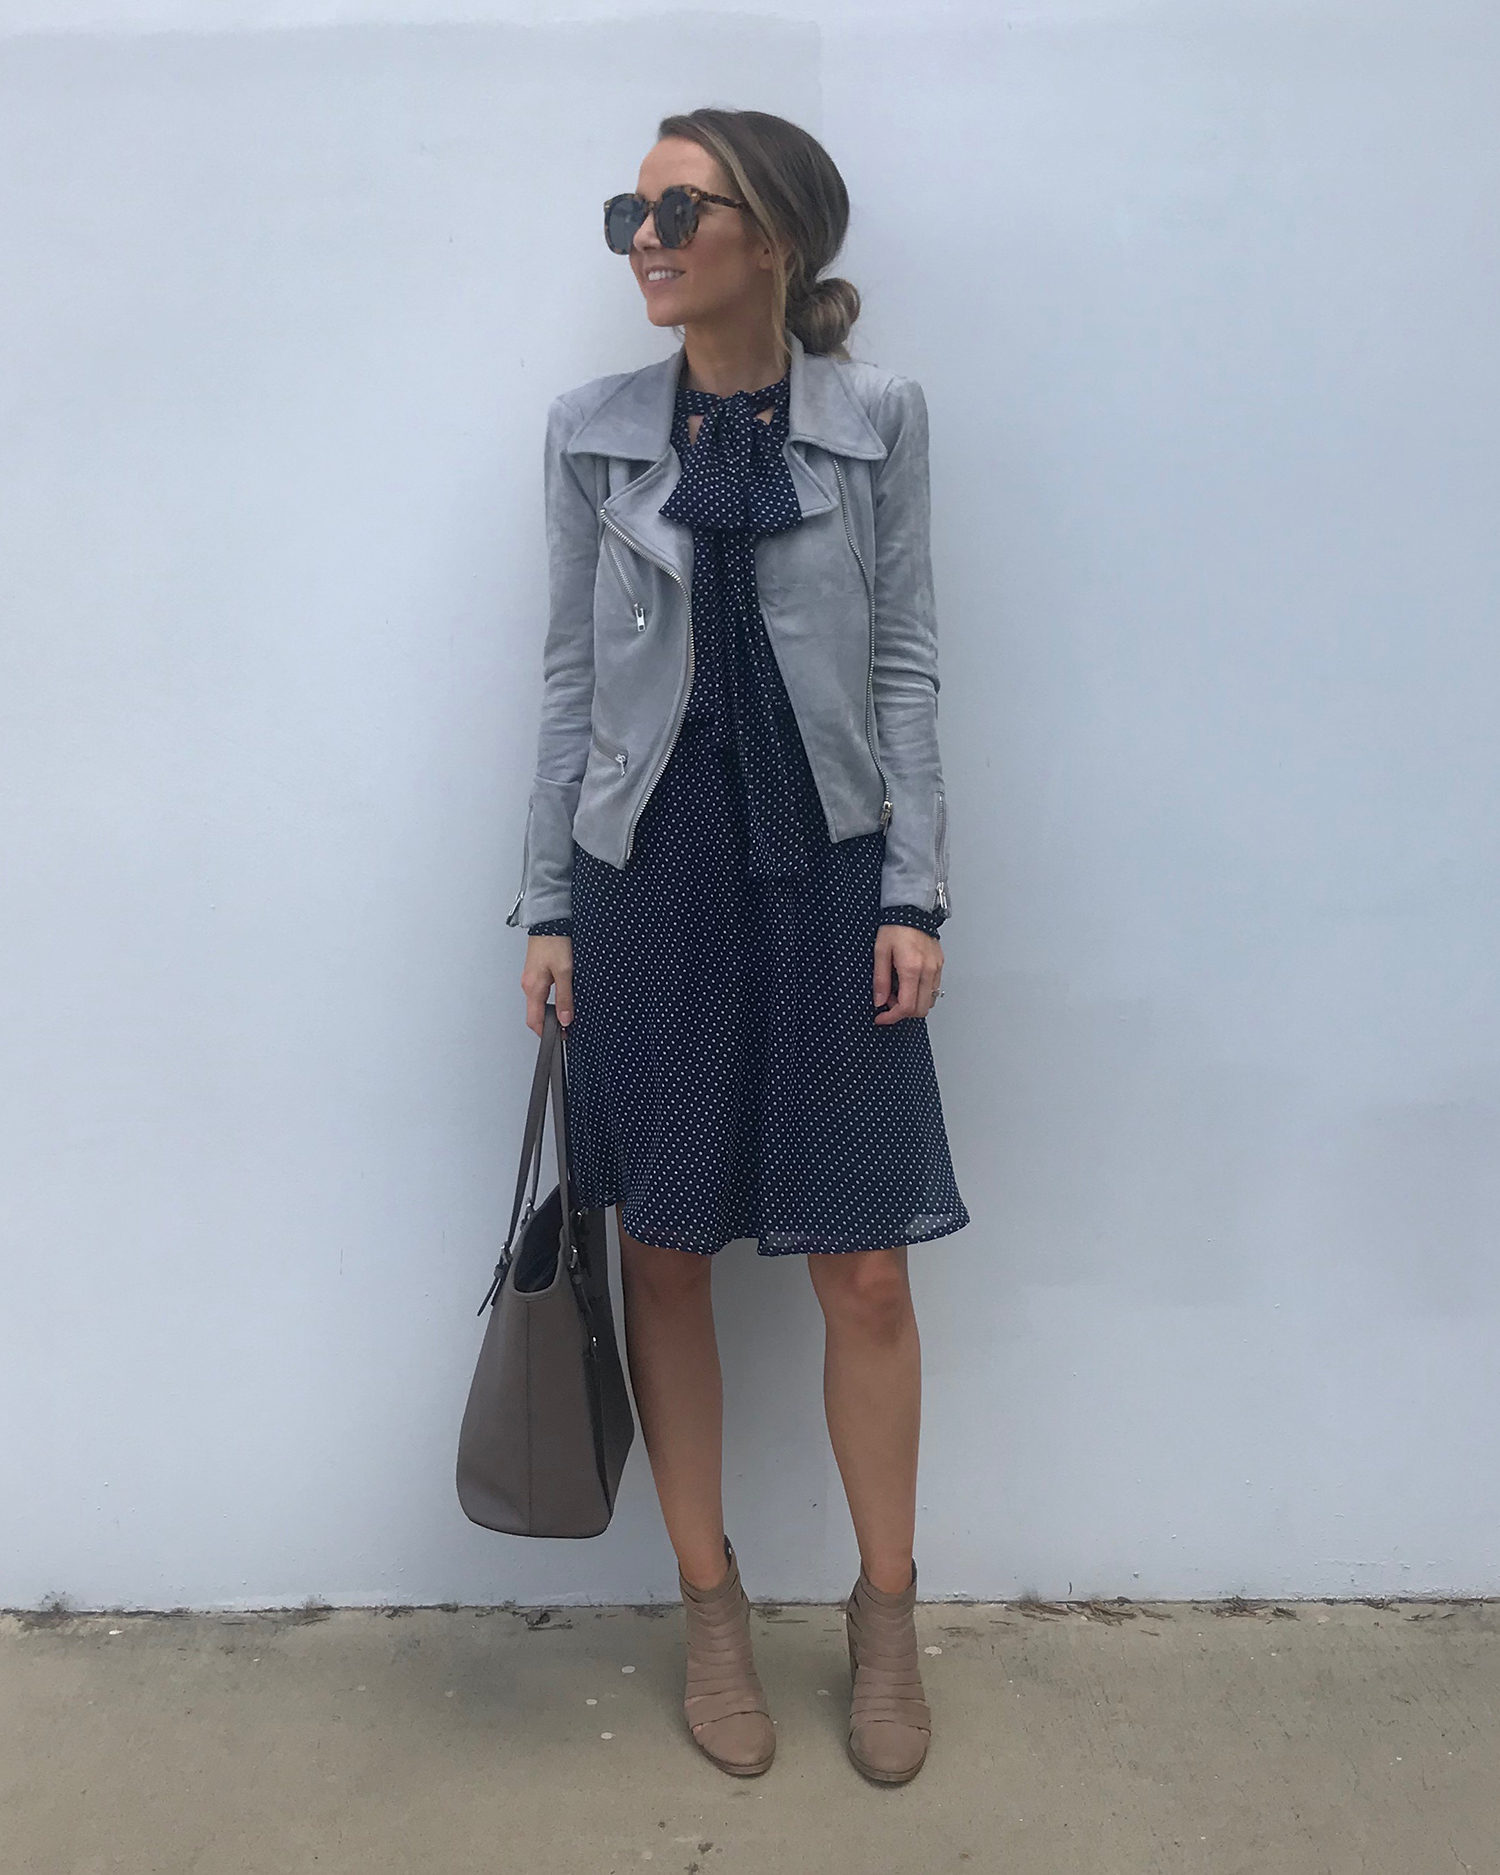 suede jacket and dress | merricksart.com